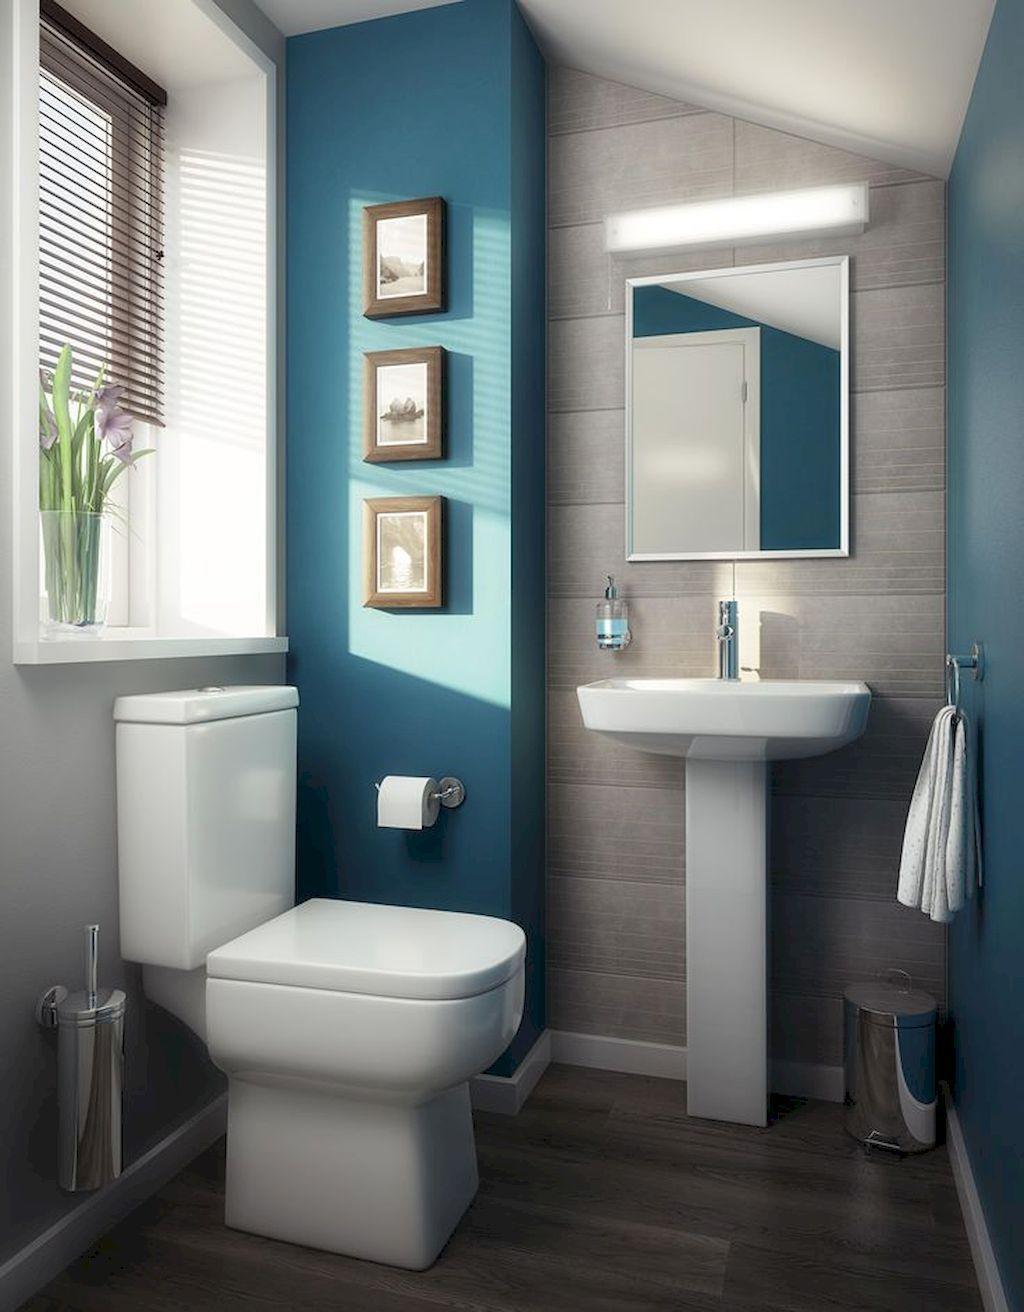 Nice 75 Efficient Small Bathroom Remodel Design Ideas Https Entrancing Small Designer Bathroom Design Ideas